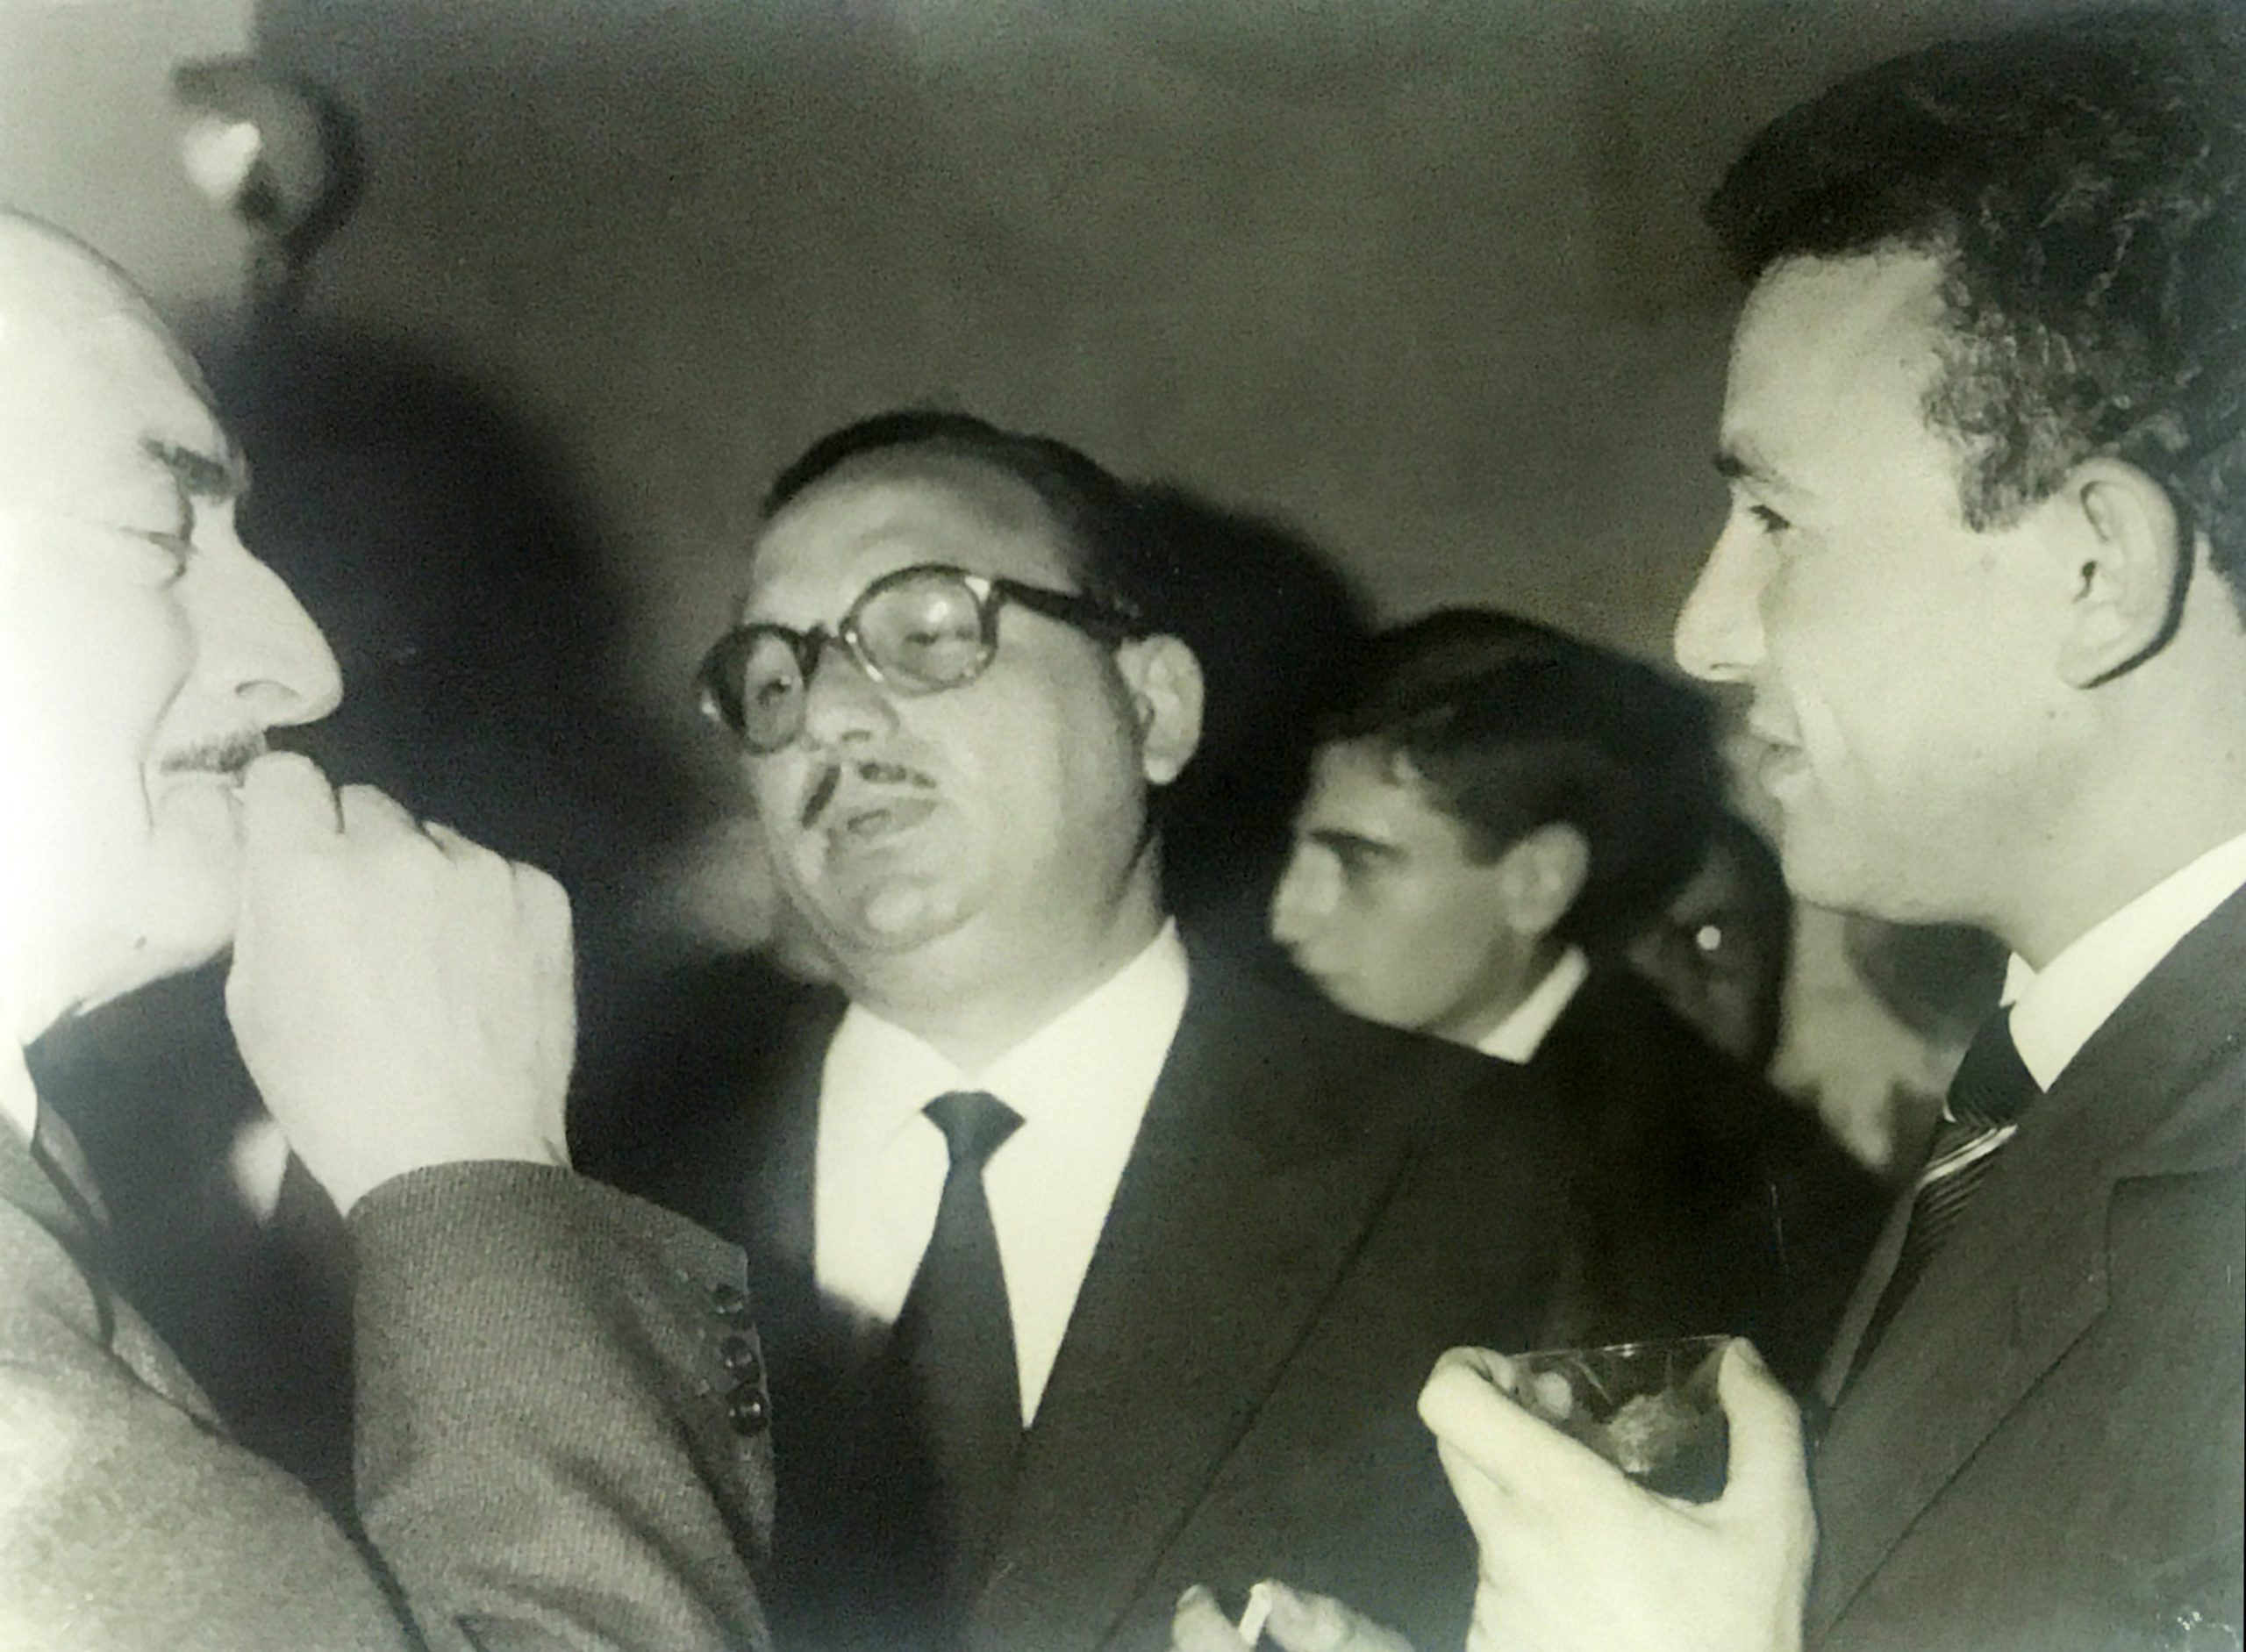 Con Salvatore Quasimodo e Fiore Torrisi